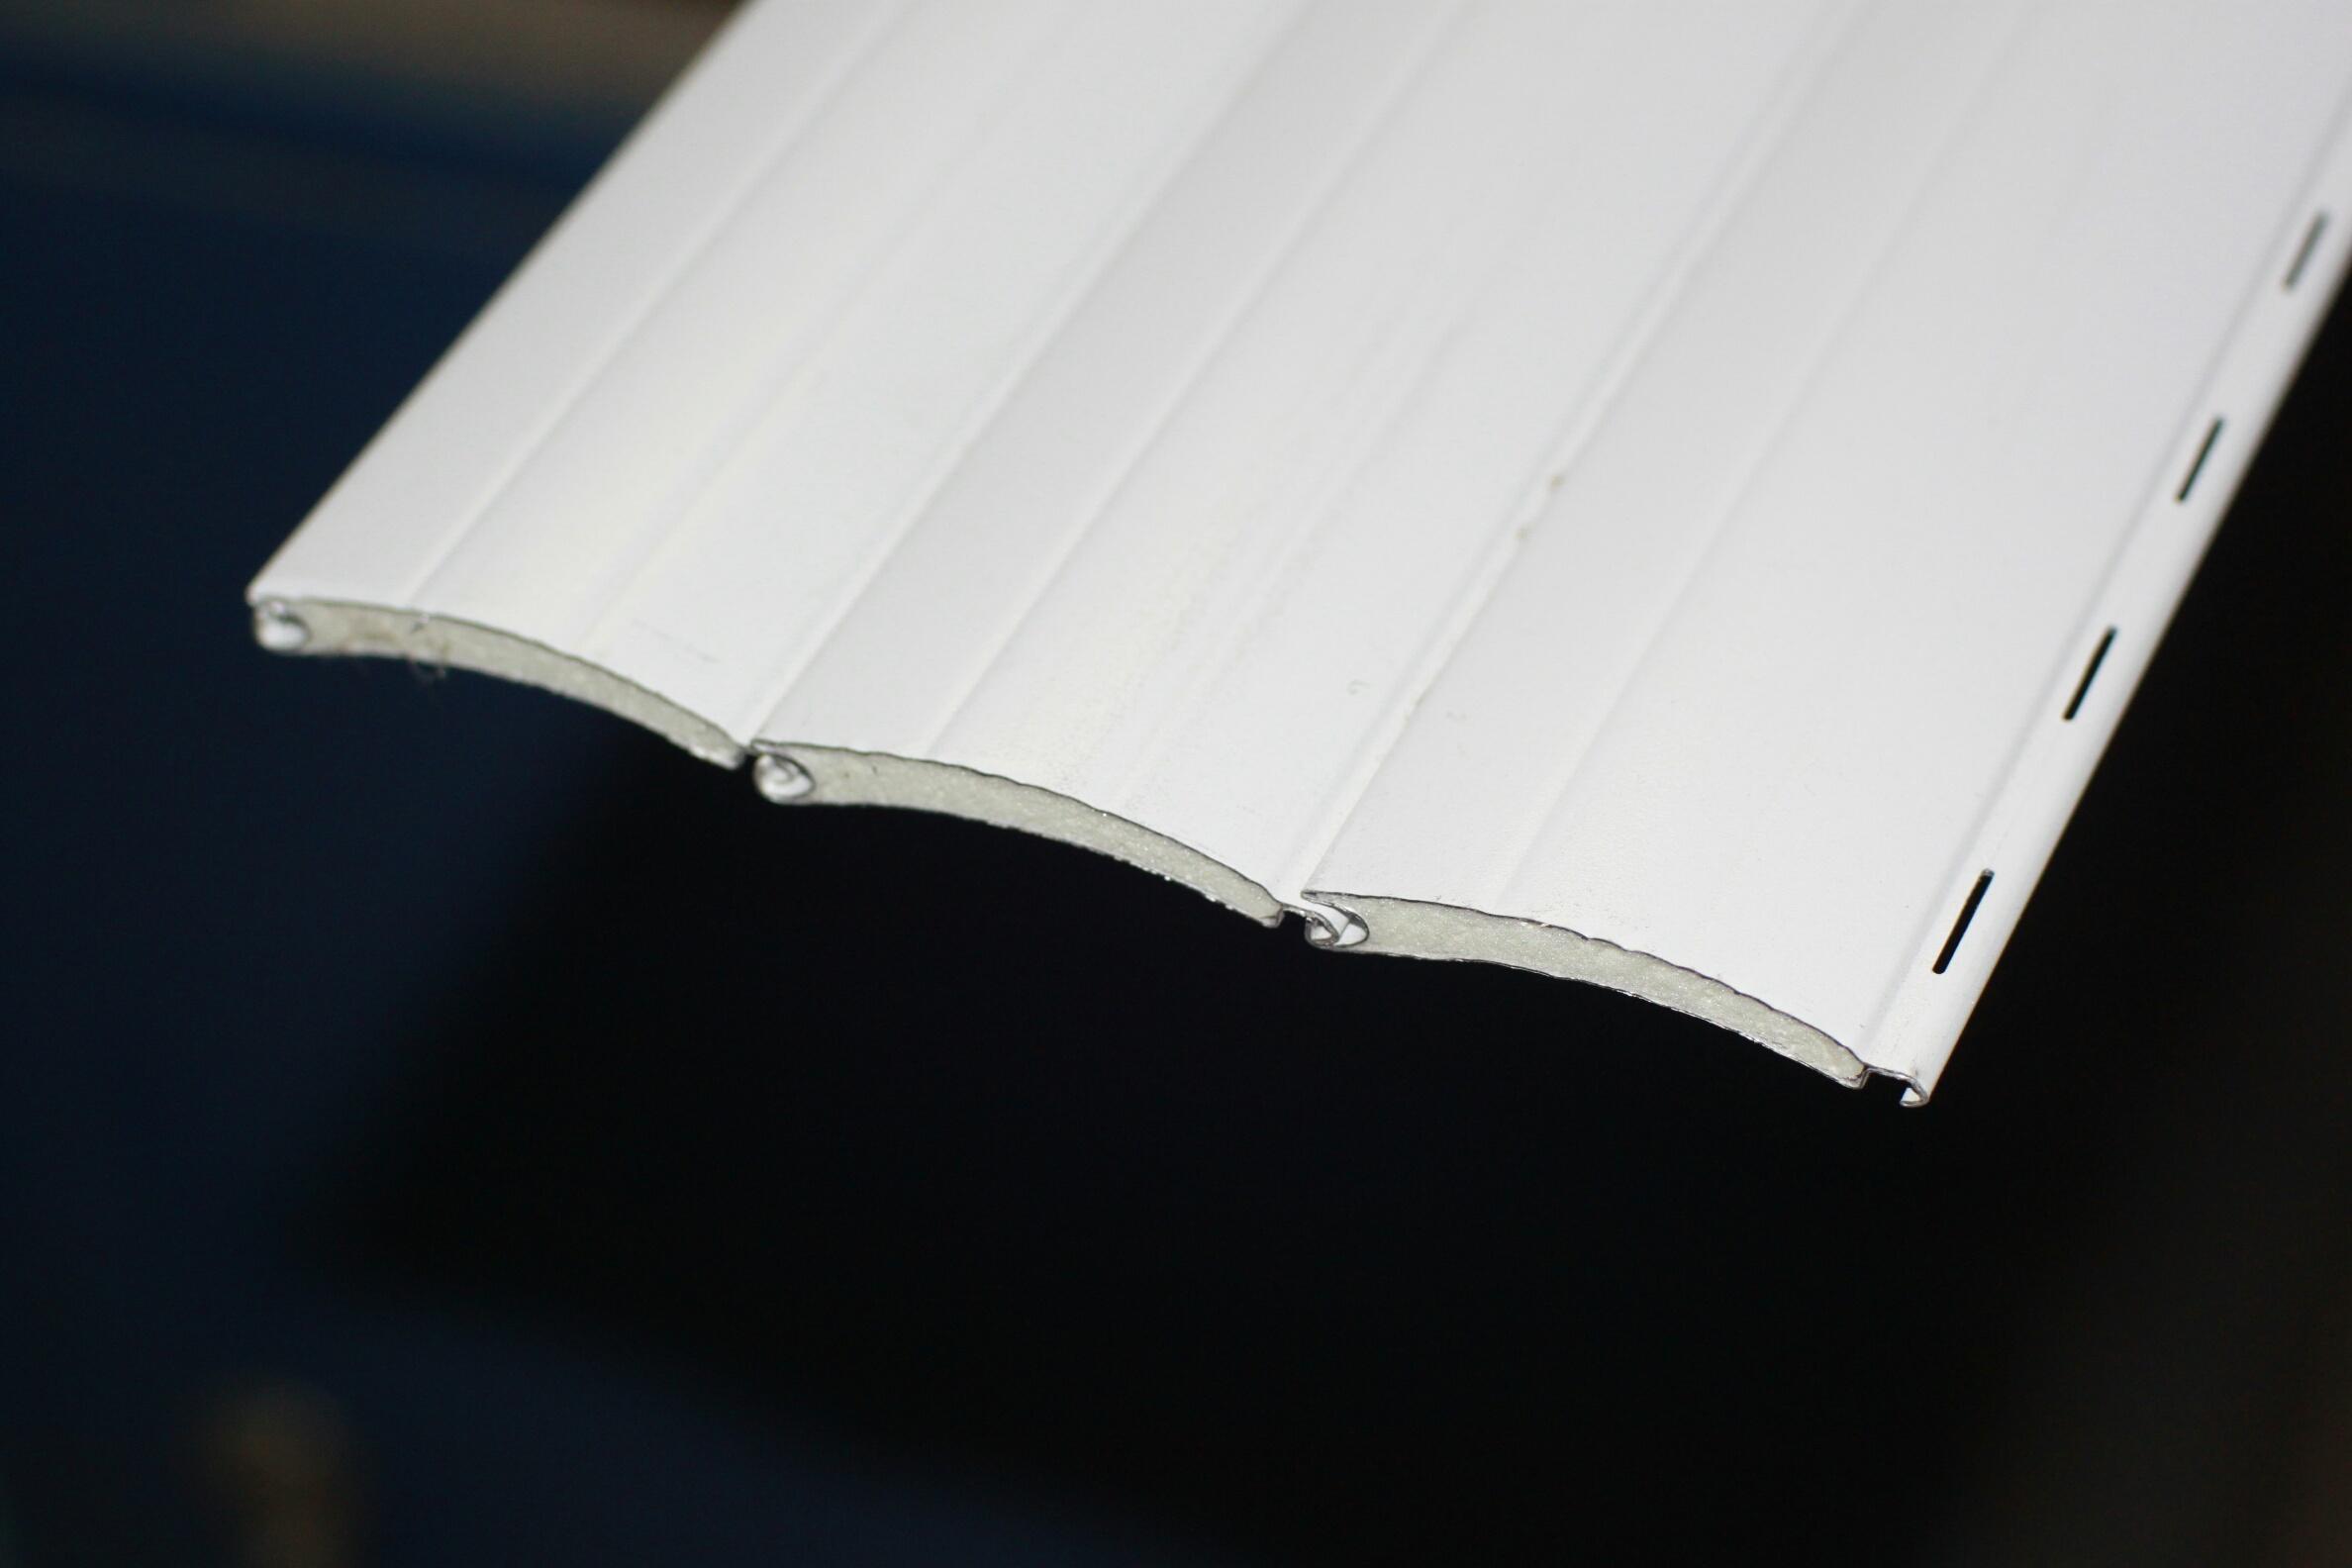 Precio persiana aluminio good buen precio persiana - Perfil de aluminio precio ...